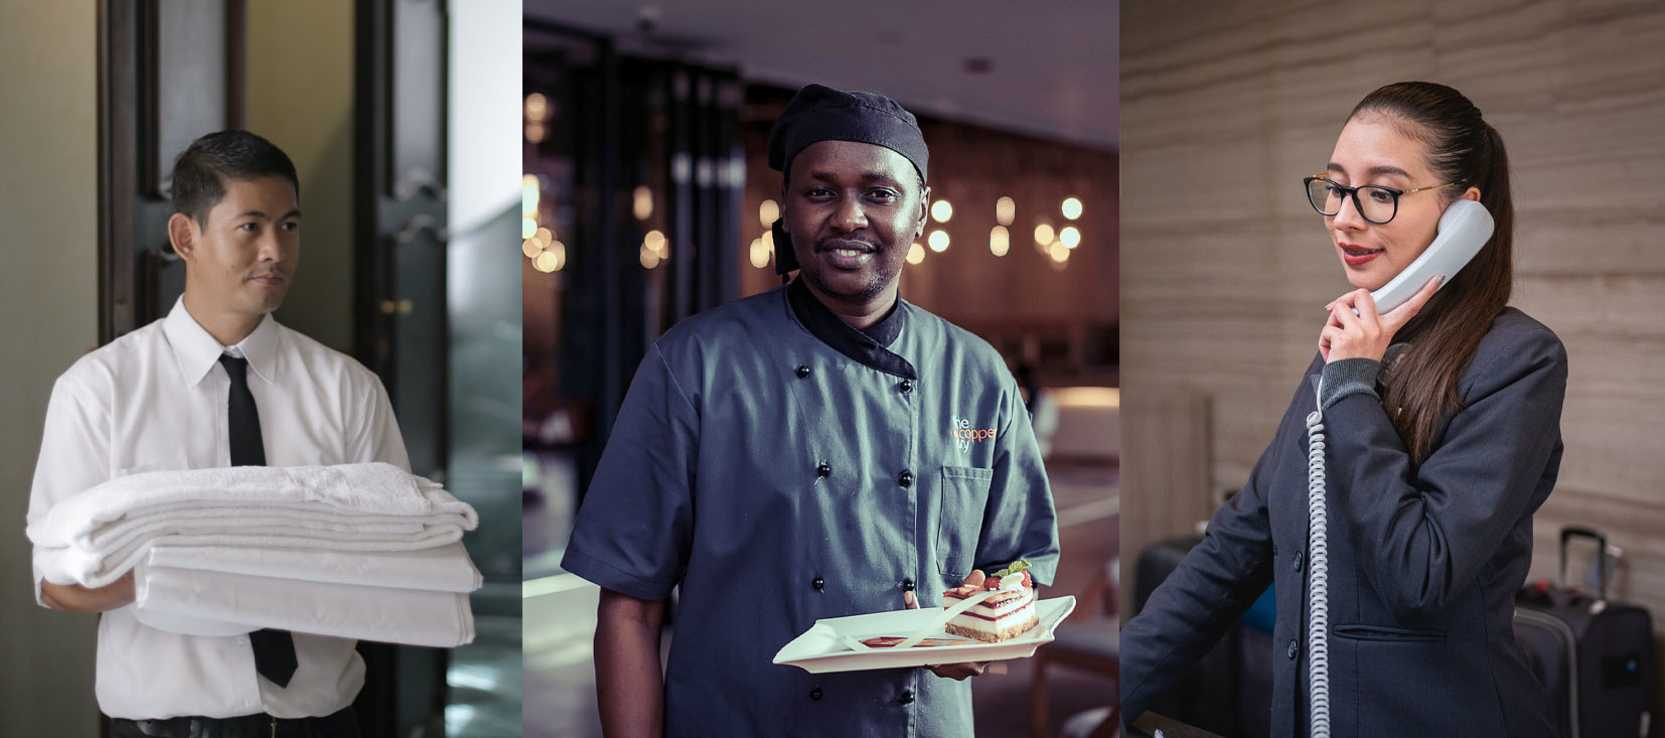 Hospitality Workforce Development